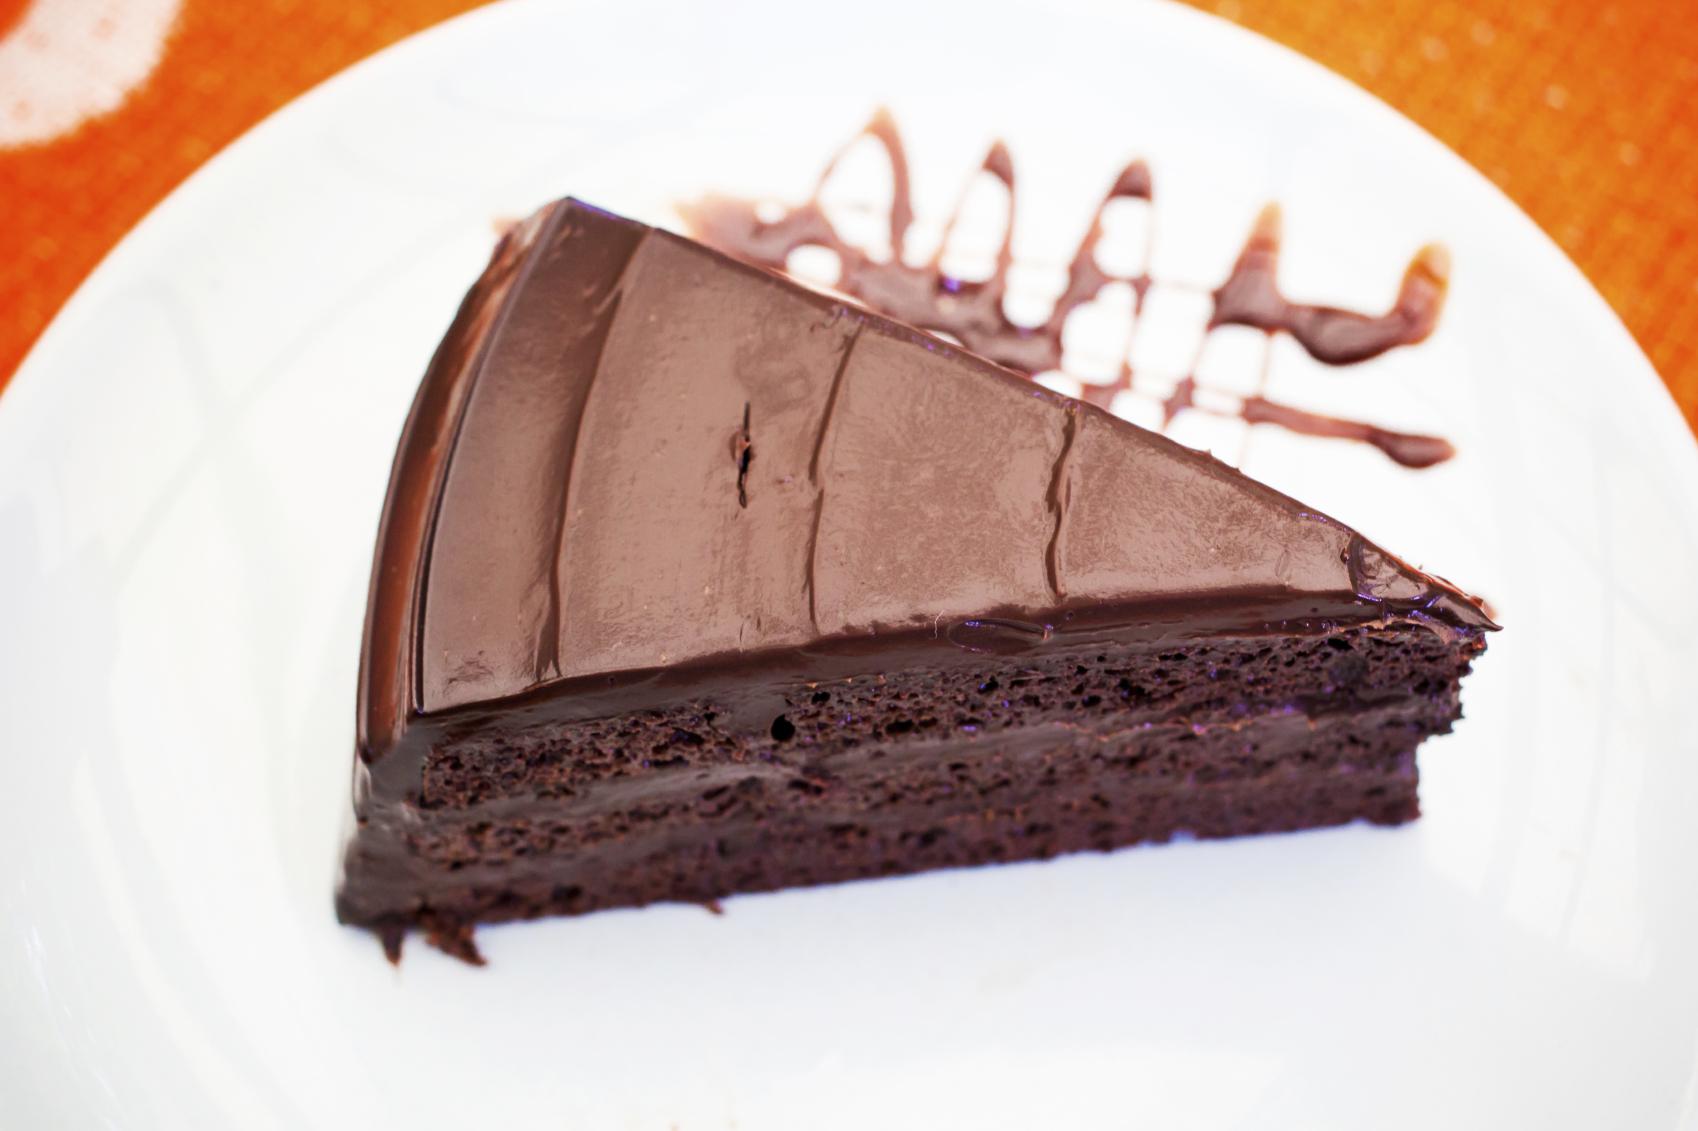 Chocolate and beet cake Kejk taċ-ċikkulata u l-pitravi